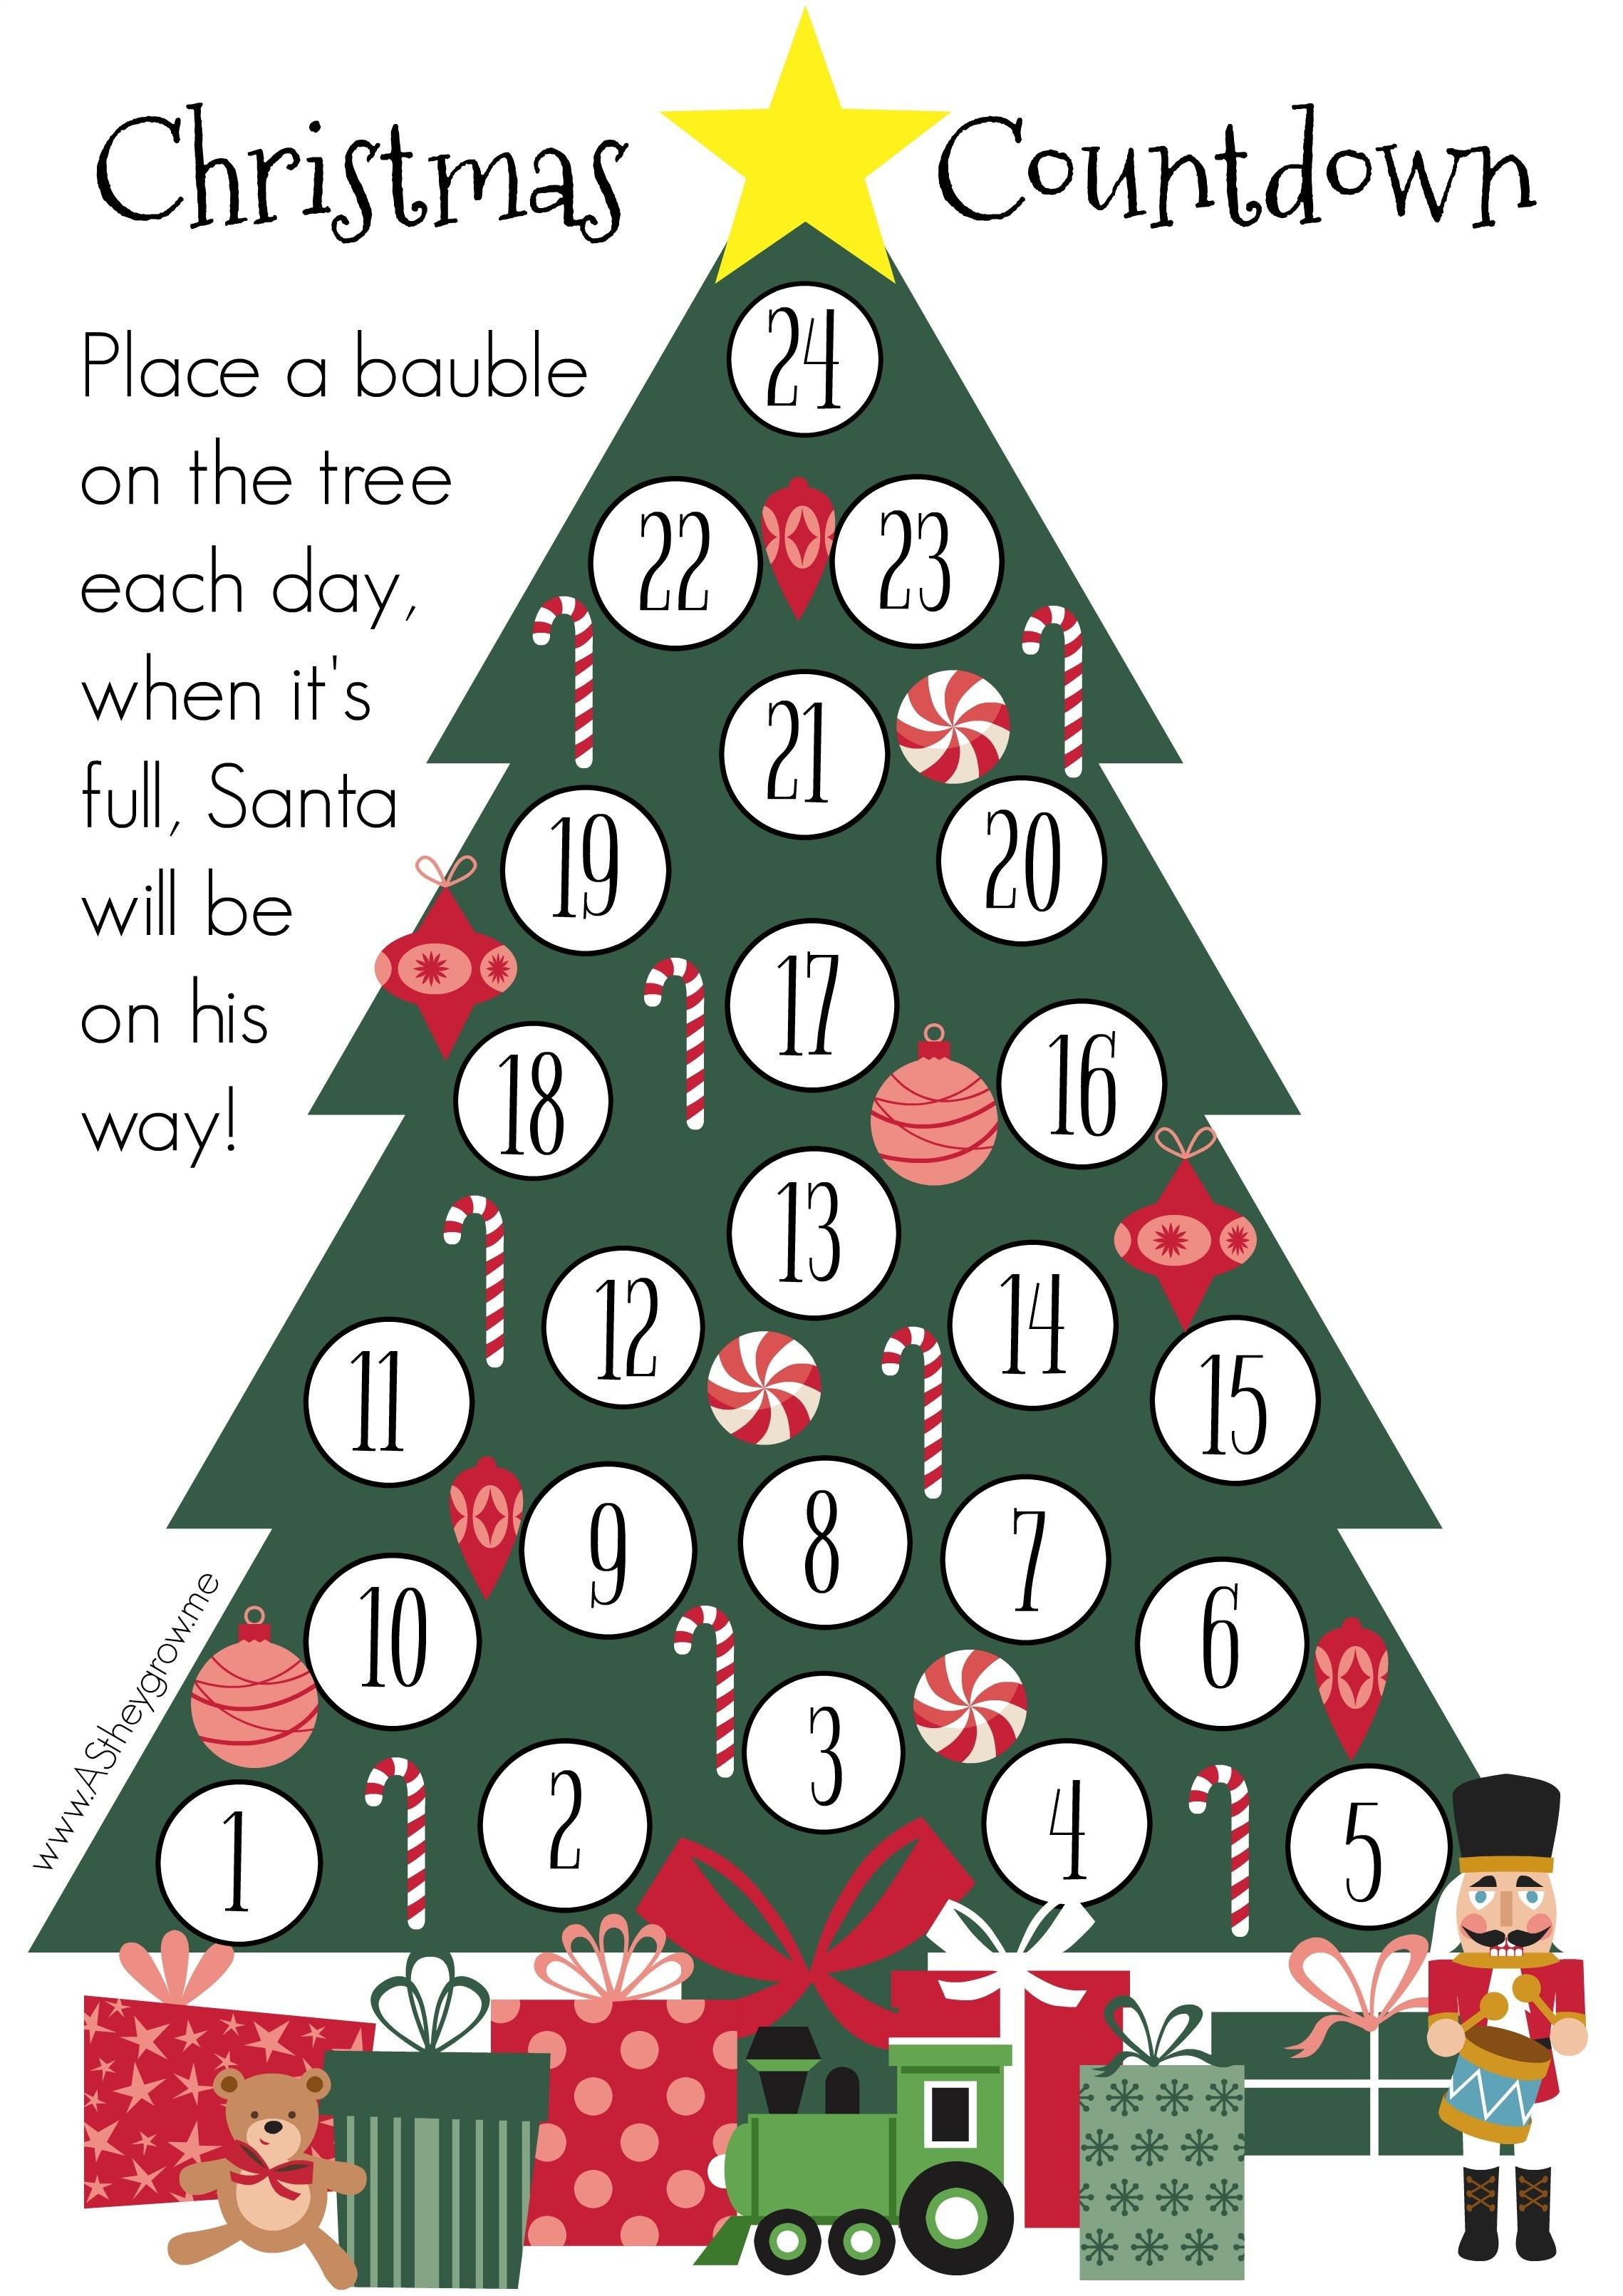 Crafty Christmas Countdown - Free Printable - As They Grow - Christmas Countdown Free Printable